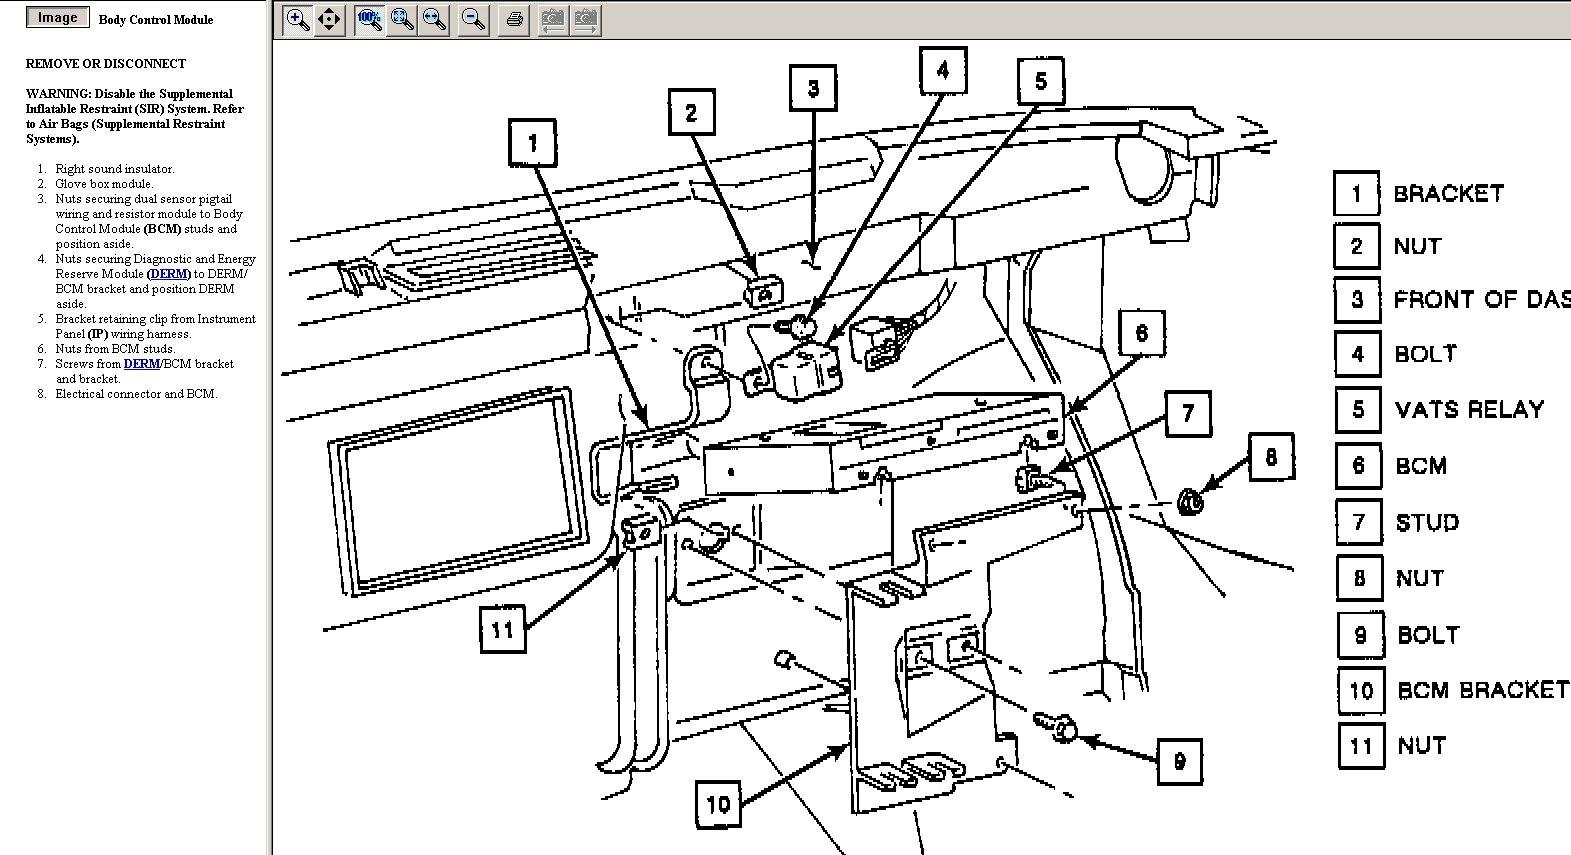 wiring diagram also cadillac sedan deville on 93 93 ford 03 Cadillac DeVille 94 Cadillac DeVille